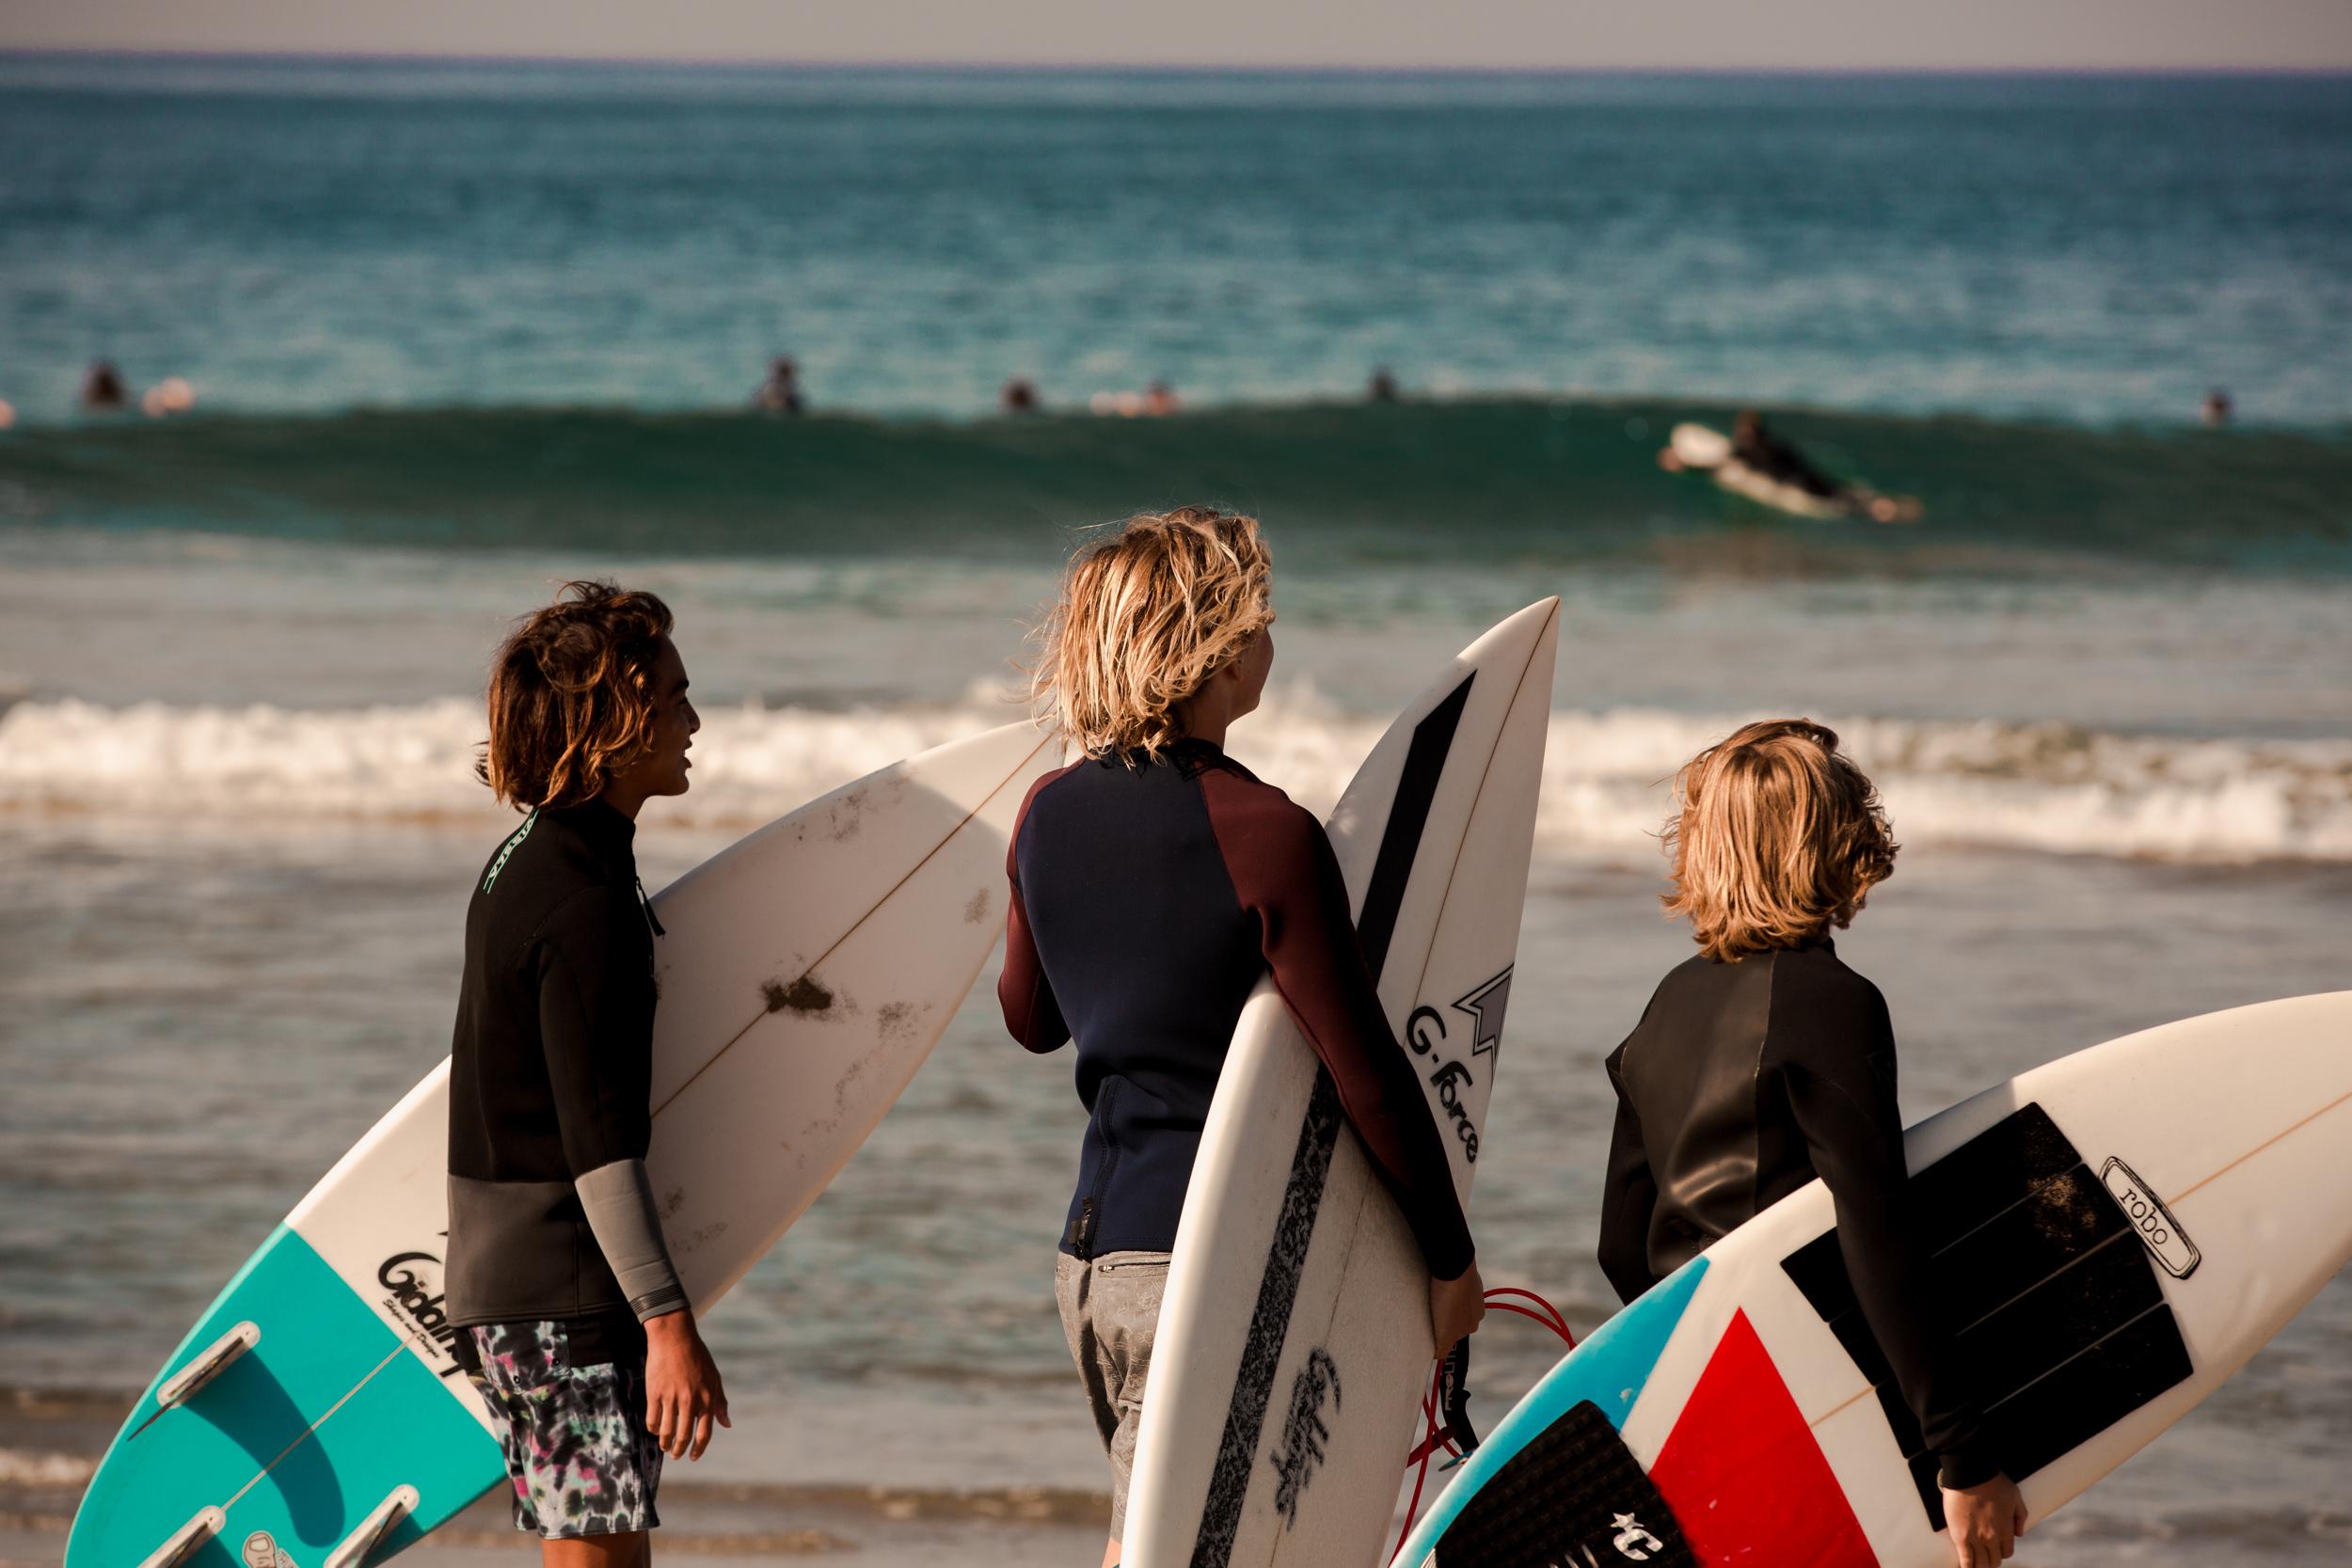 Surf_Newport_July29-4.JPG